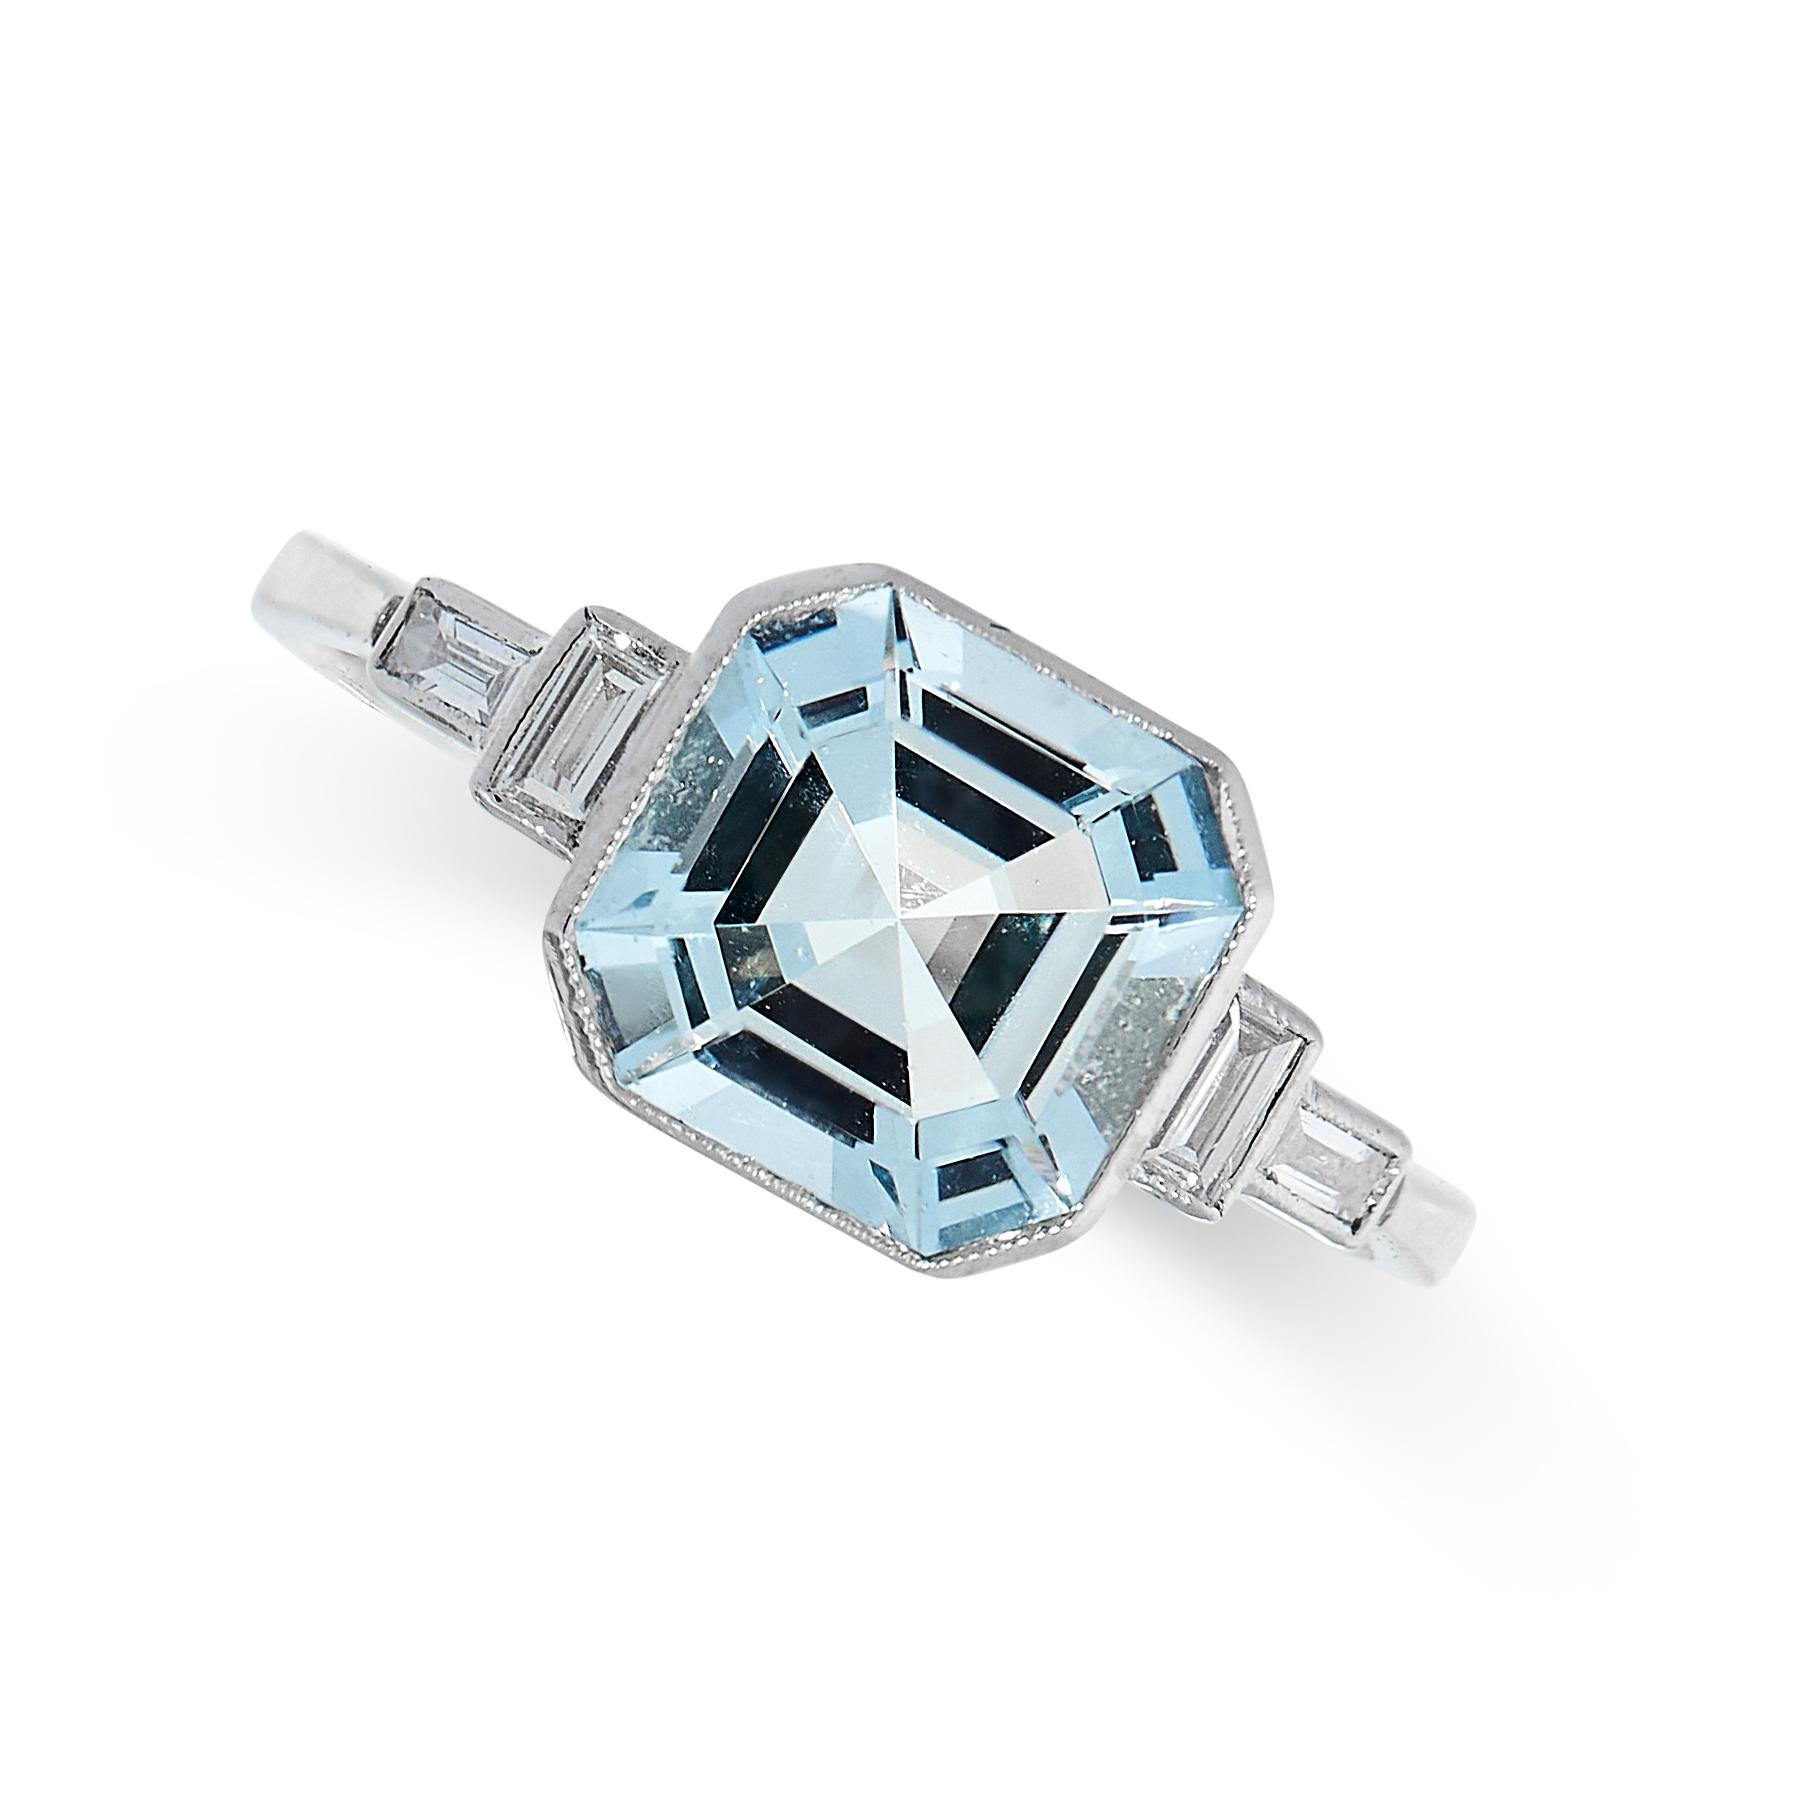 AQUAMARINE AND DIAMOND RING in platinum, set with an octagonal cut aquamarine of 2.23 carats between